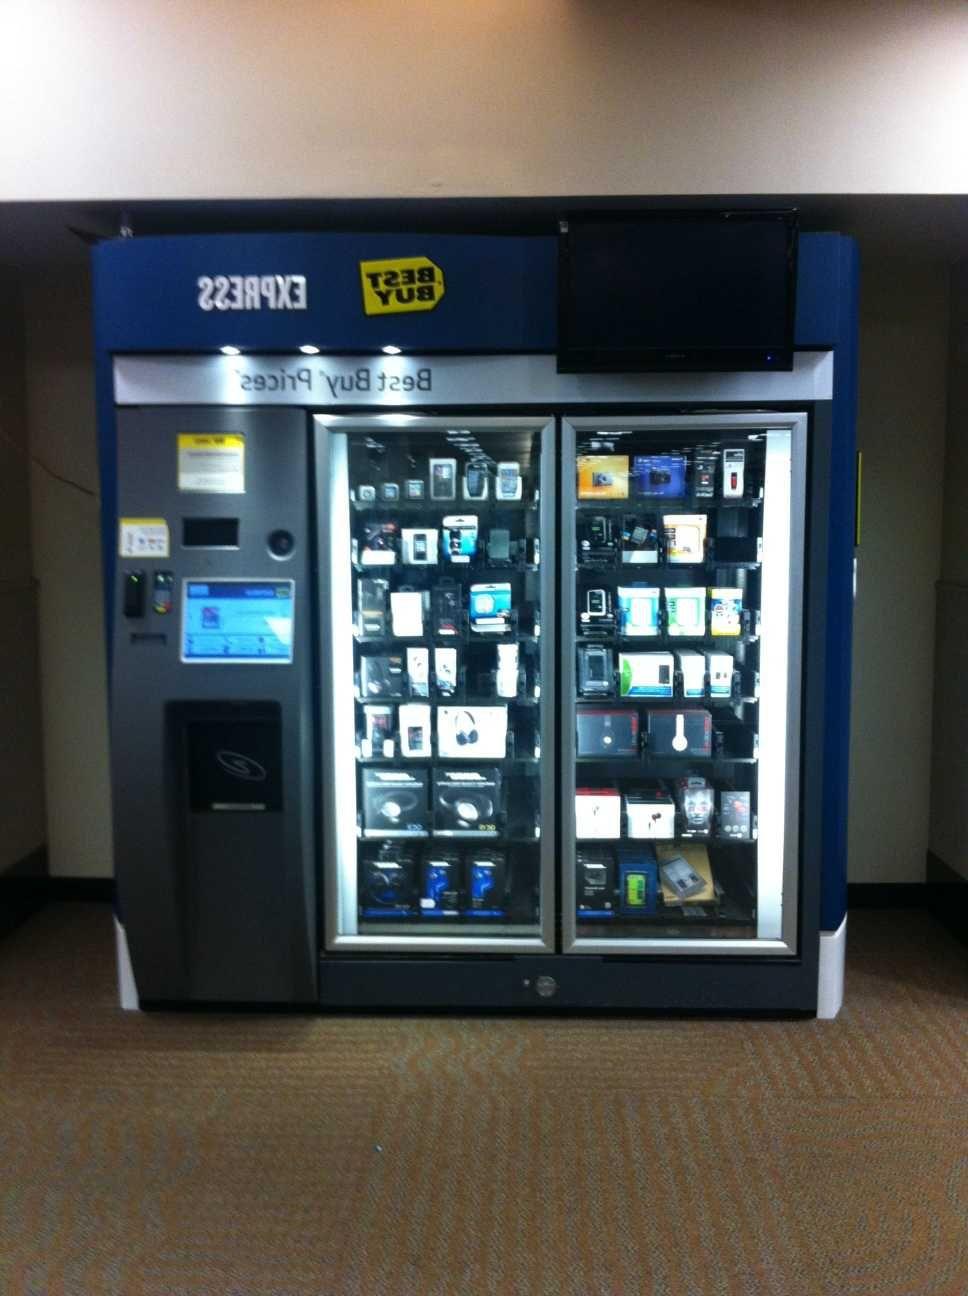 Best Buy Tech Vending Machine Minneapolis Airport Engagement At Coffee Vending Machines Vending Machine Vending Machines For Sale